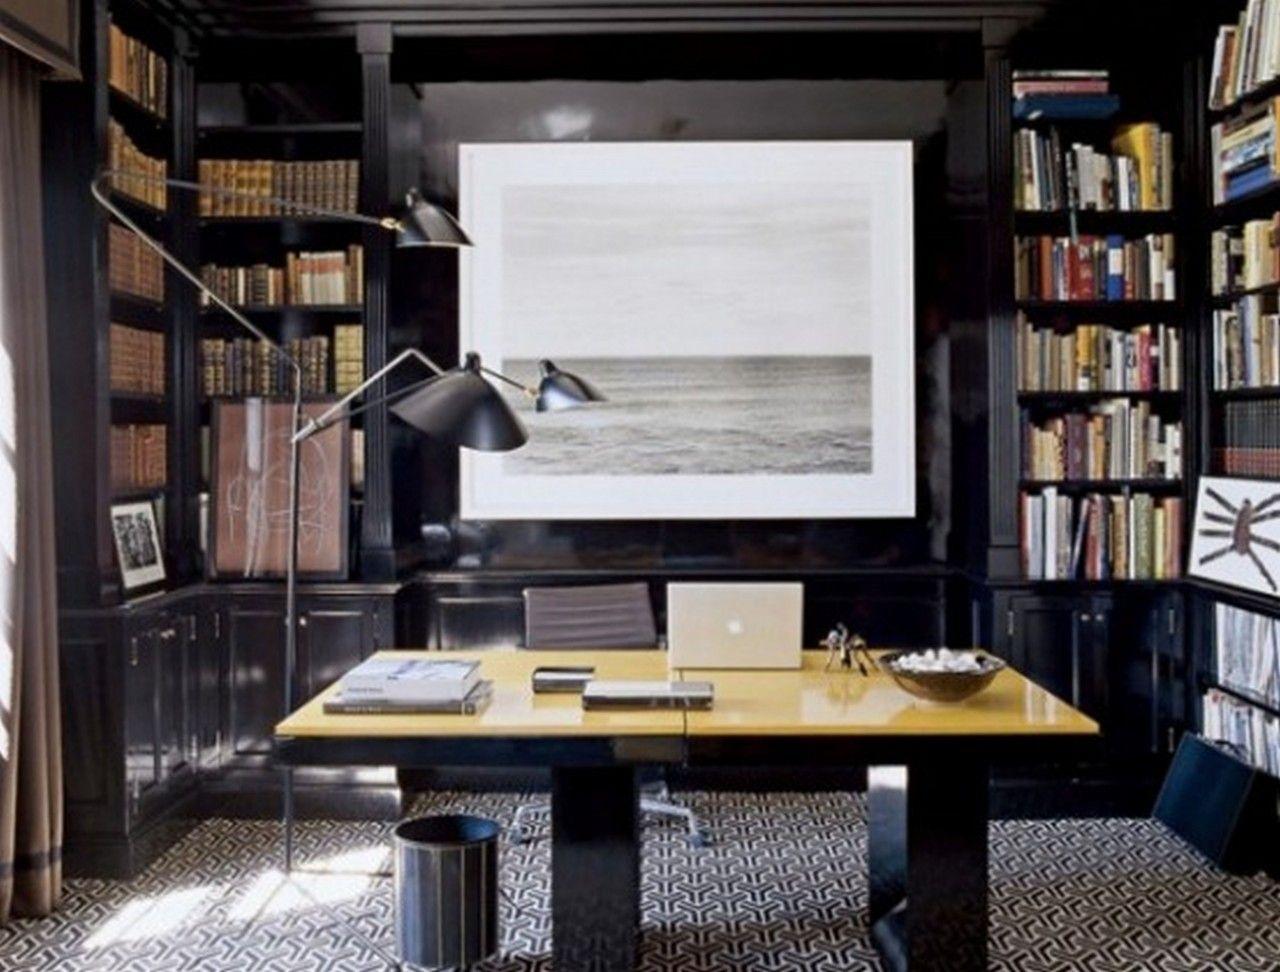 astounding home office ideas modern interior design. Home Office Small Space Contemporary Classic Interior Design Ideas For Spaces In A Astounding Modern S